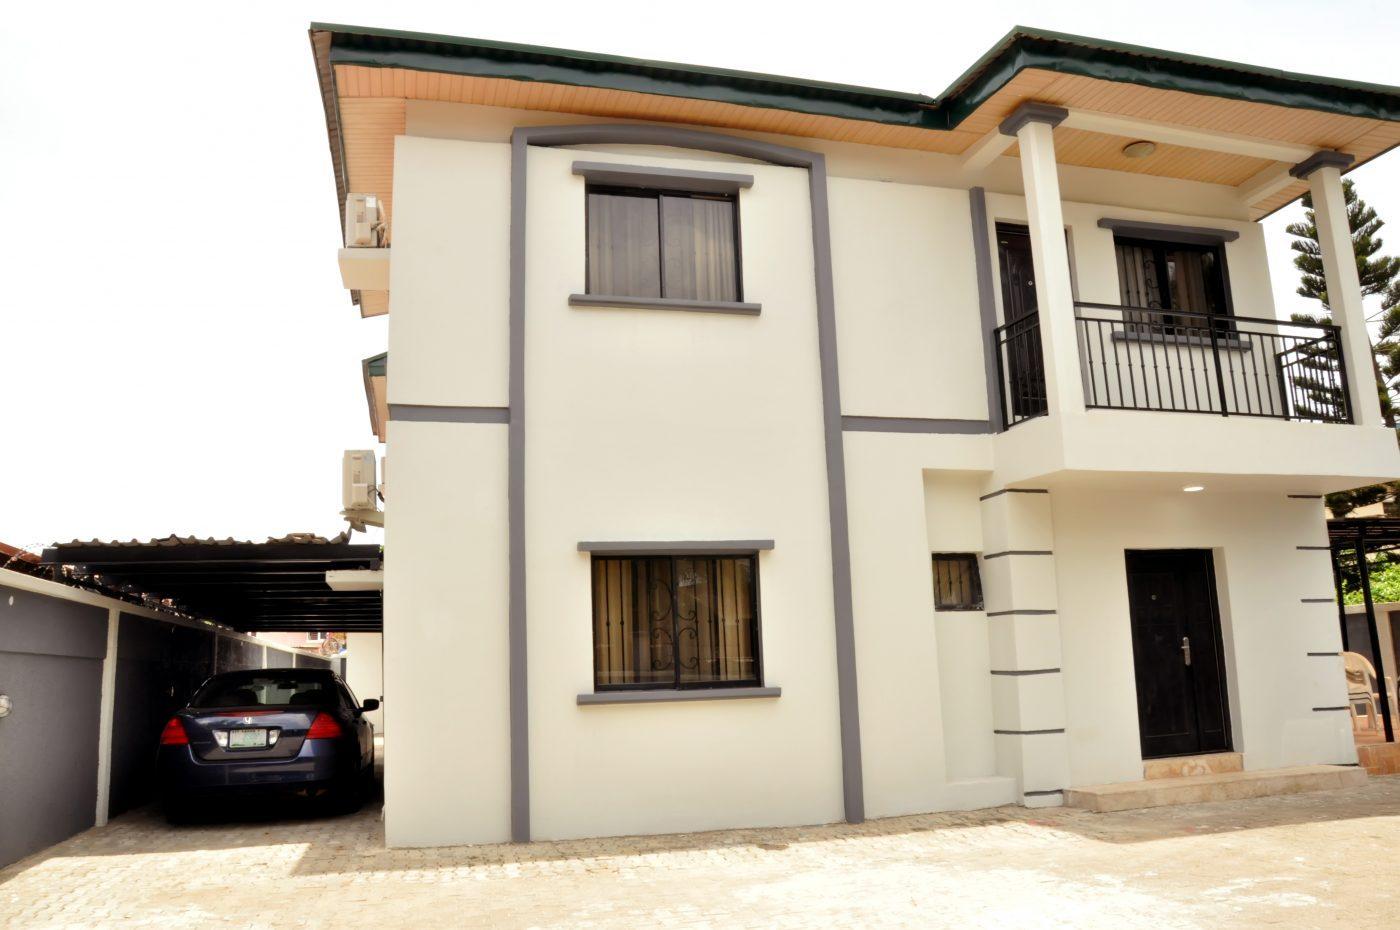 Duplex for sale at Omole Phase 1, Ikeja.